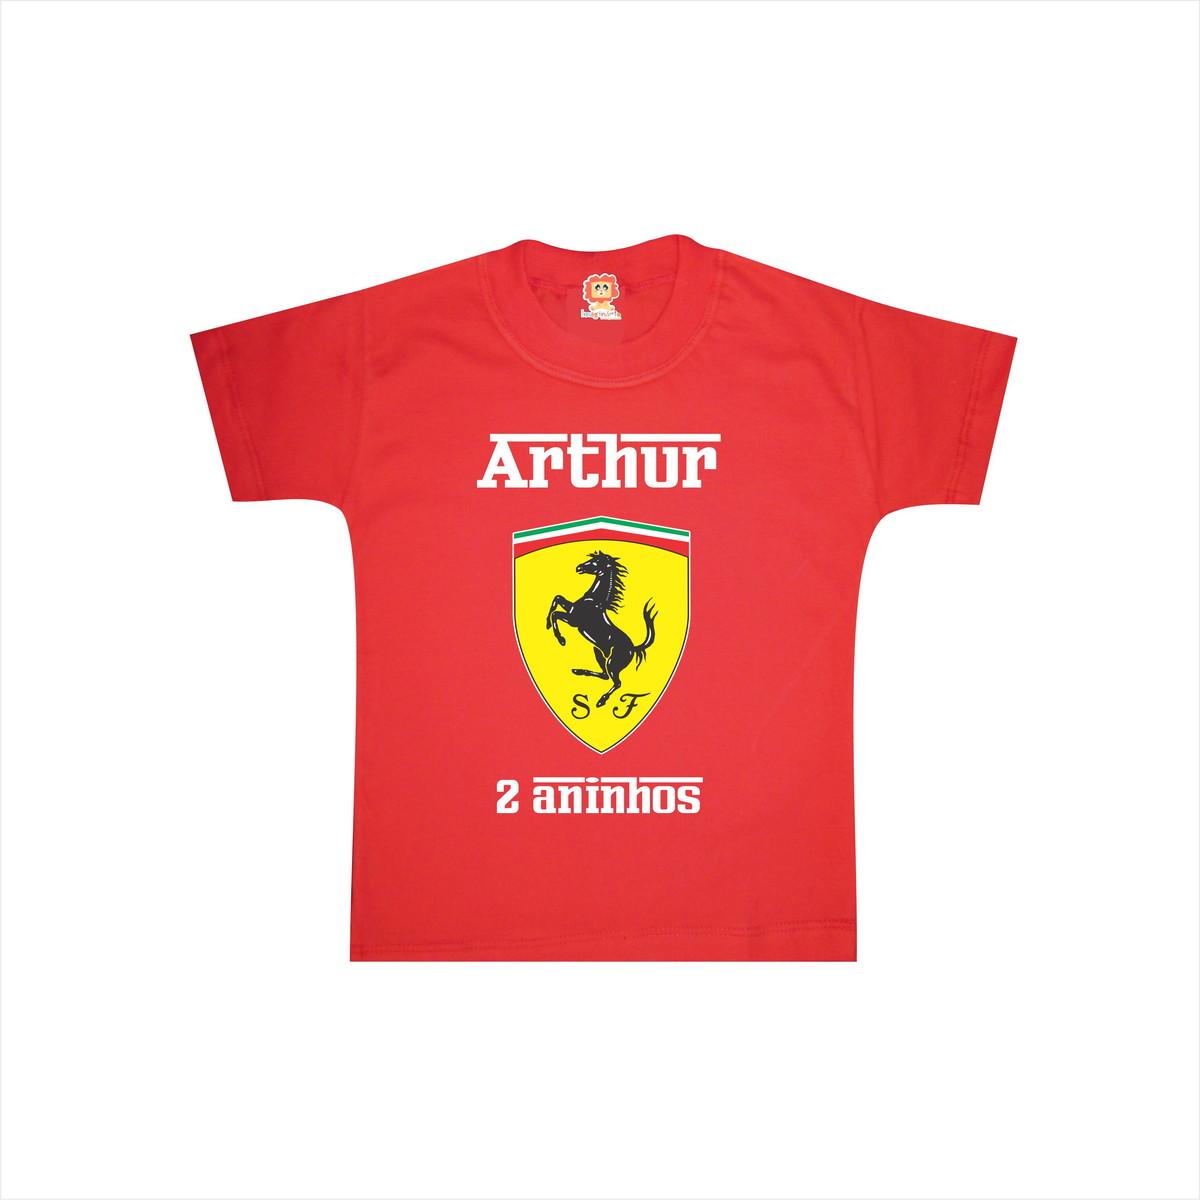 446191292d Camiseta Infantil Ferrari no Elo7